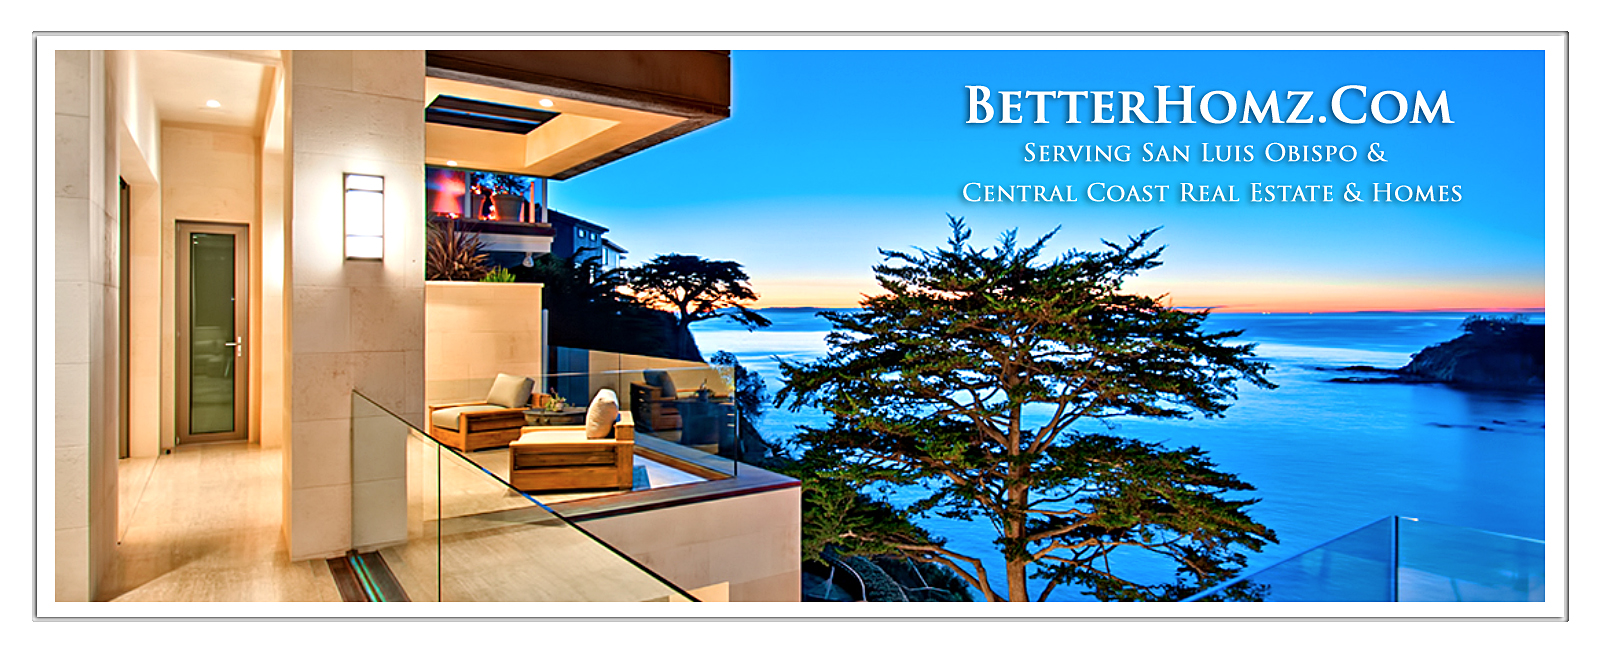 San Luis Obispo Real Estate | Pismo Beach Real Estate, Homes For Sale